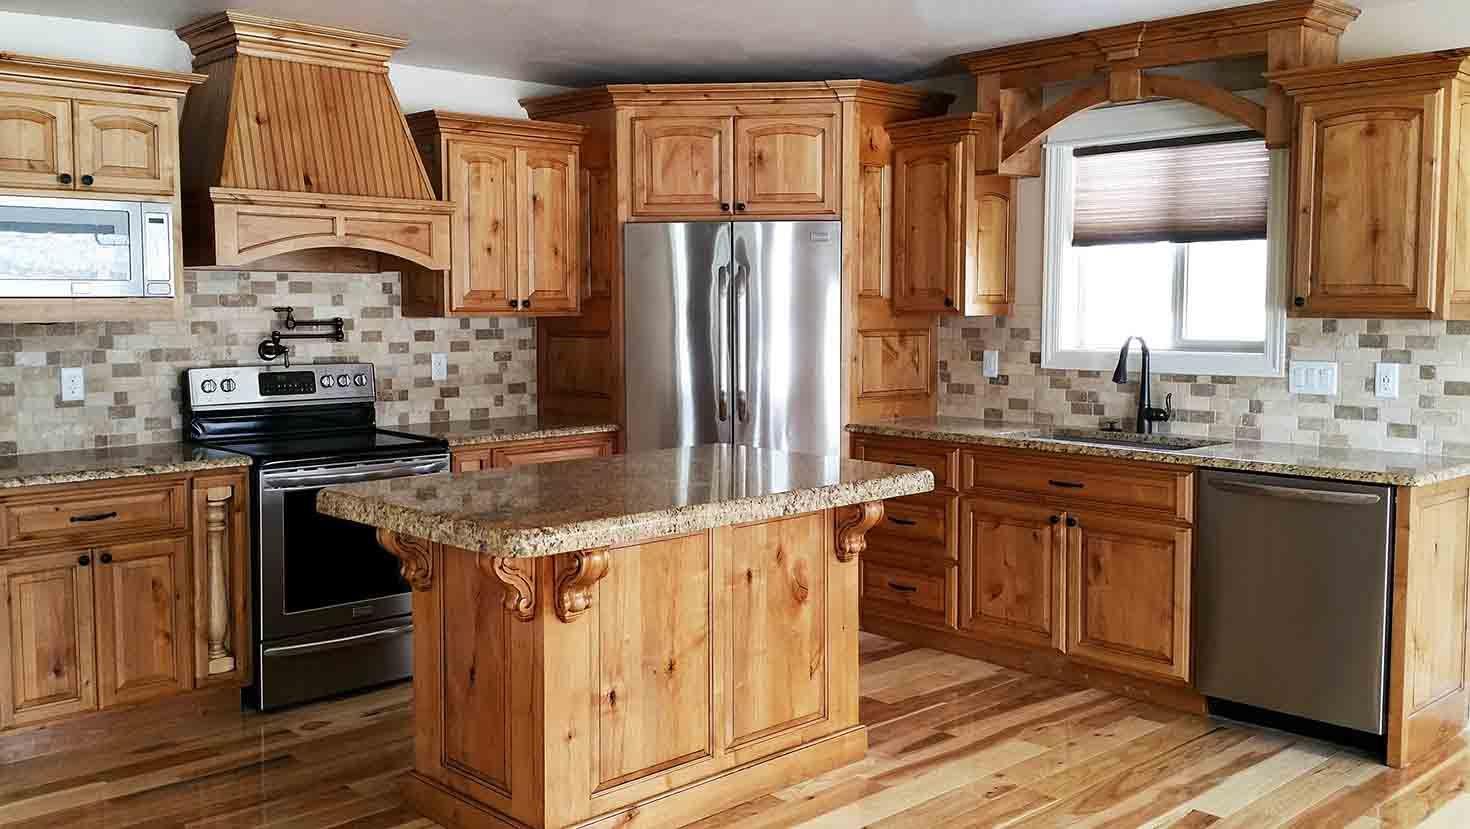 Image Result For Kitchens With Fridge In Corner Home Design